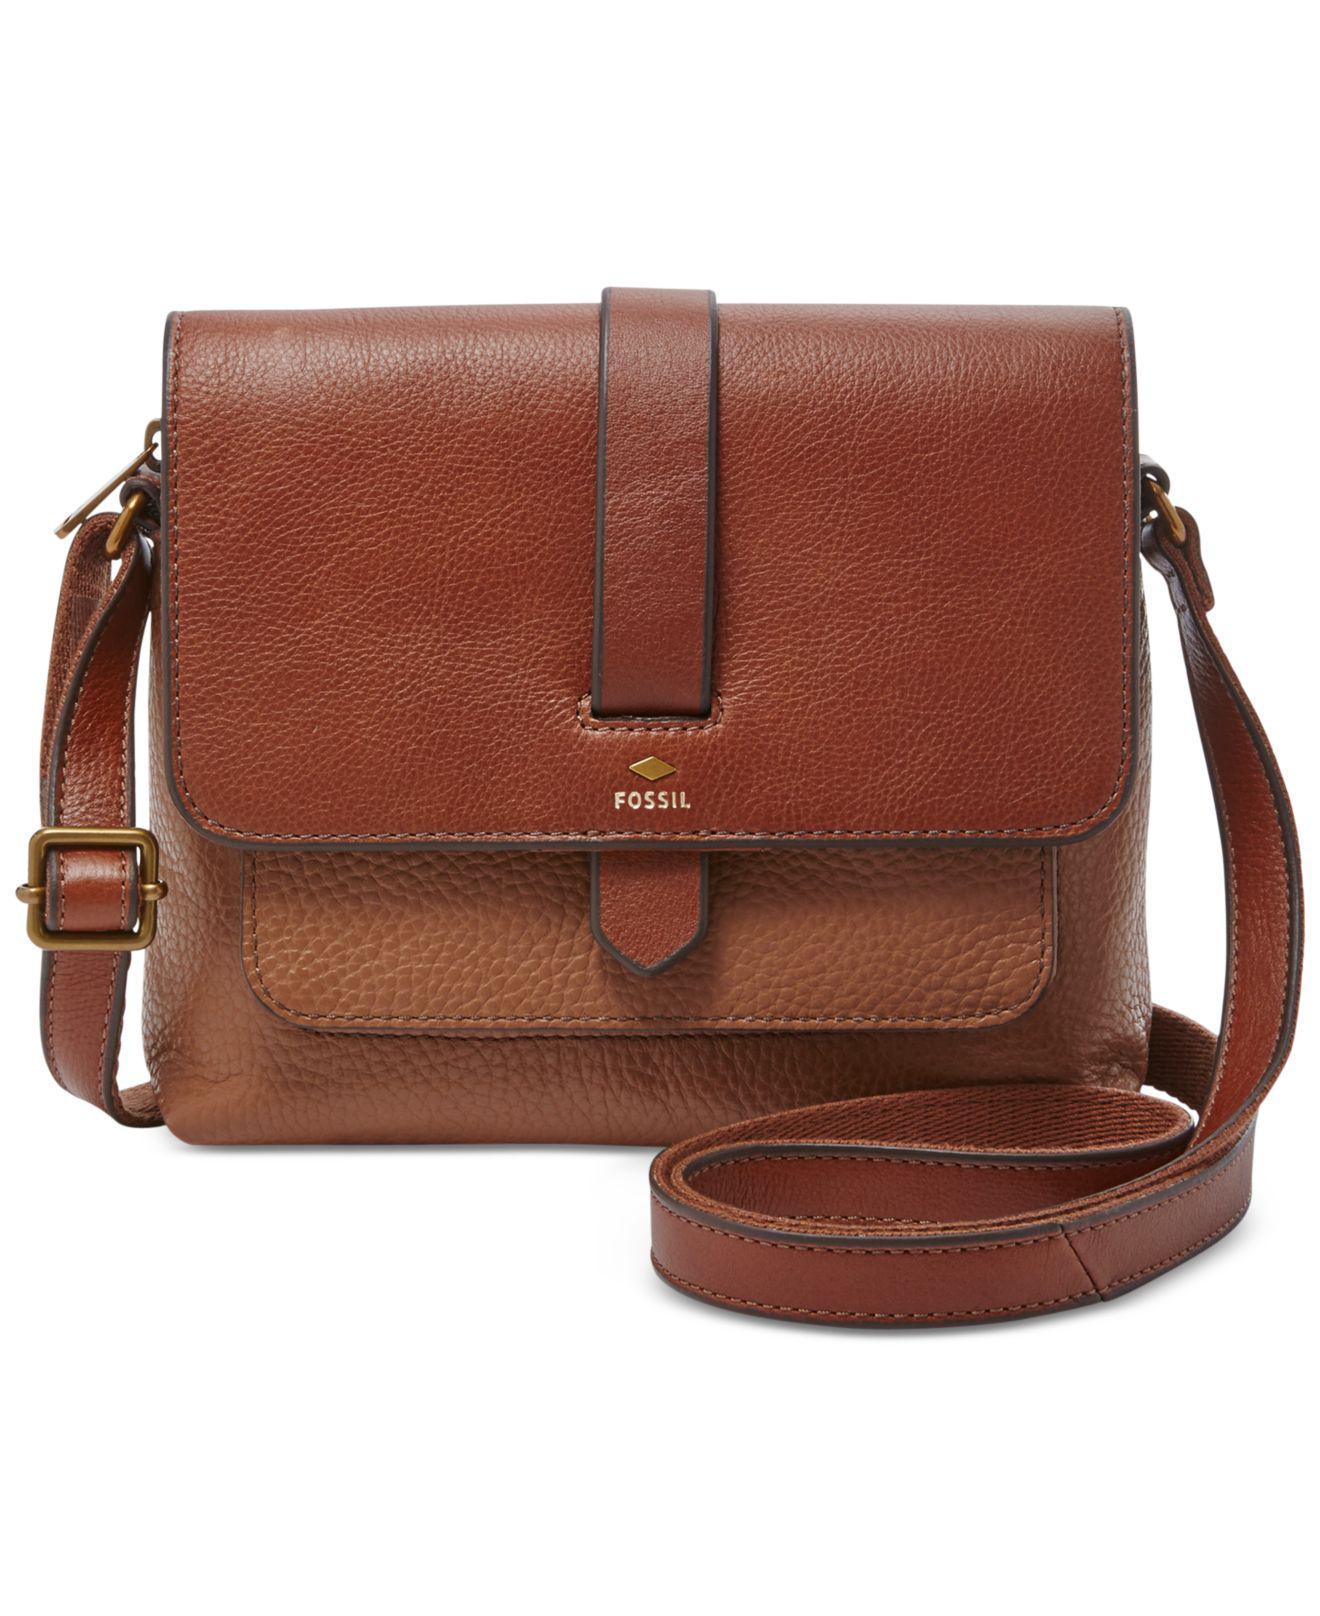 4b79f9506fe8 Lyst - Fossil Kinley Small Crossbody Handbag Brown in Brown - Save 7%